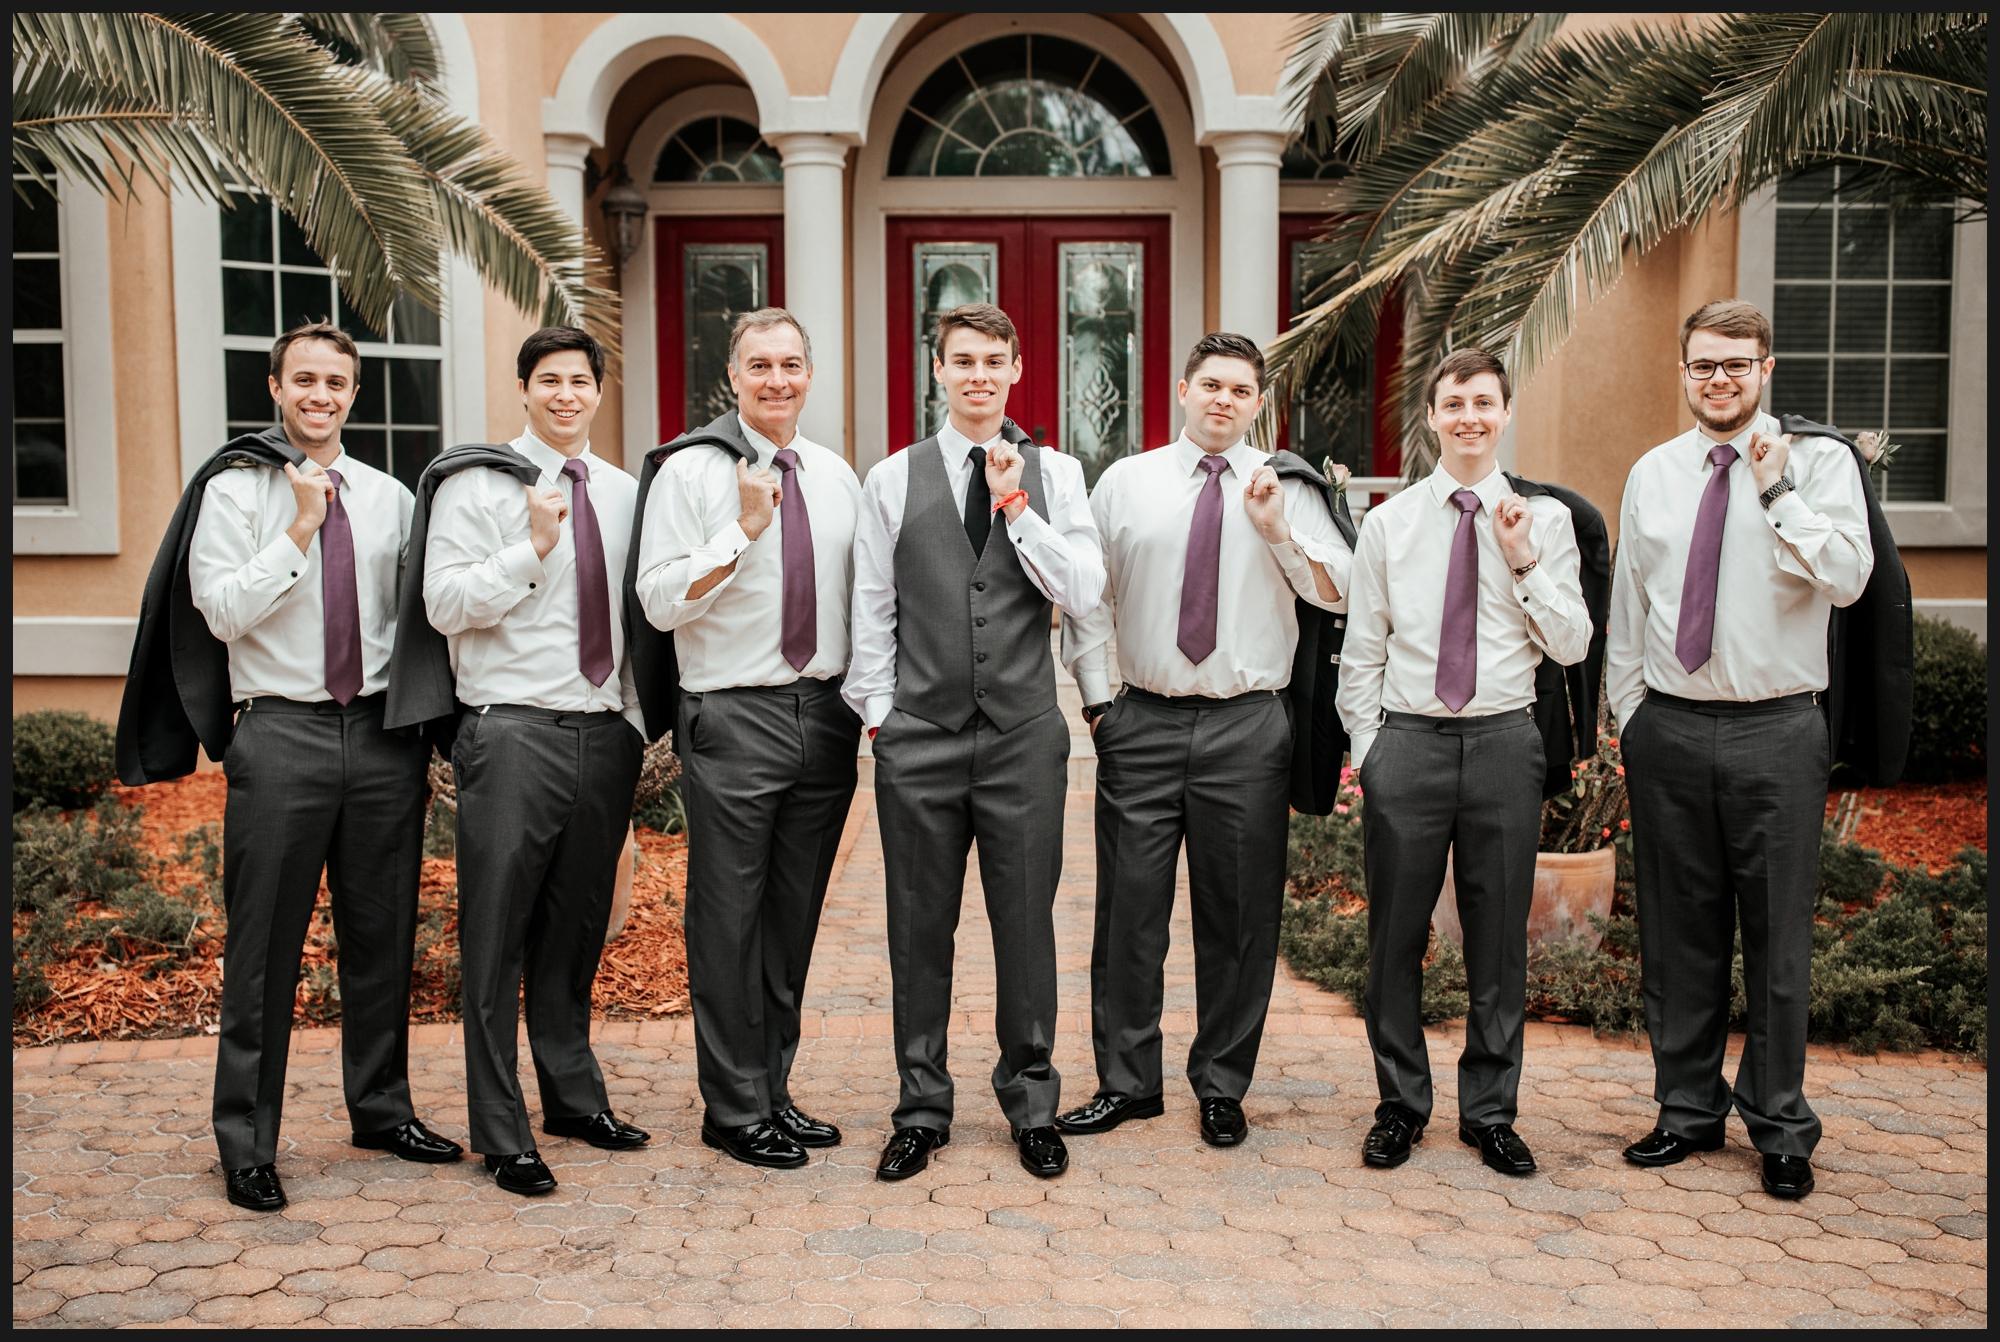 Orlando-Wedding-Photographer-destination-wedding-photographer-florida-wedding-photographer-bohemian-wedding-photographer_1438.jpg